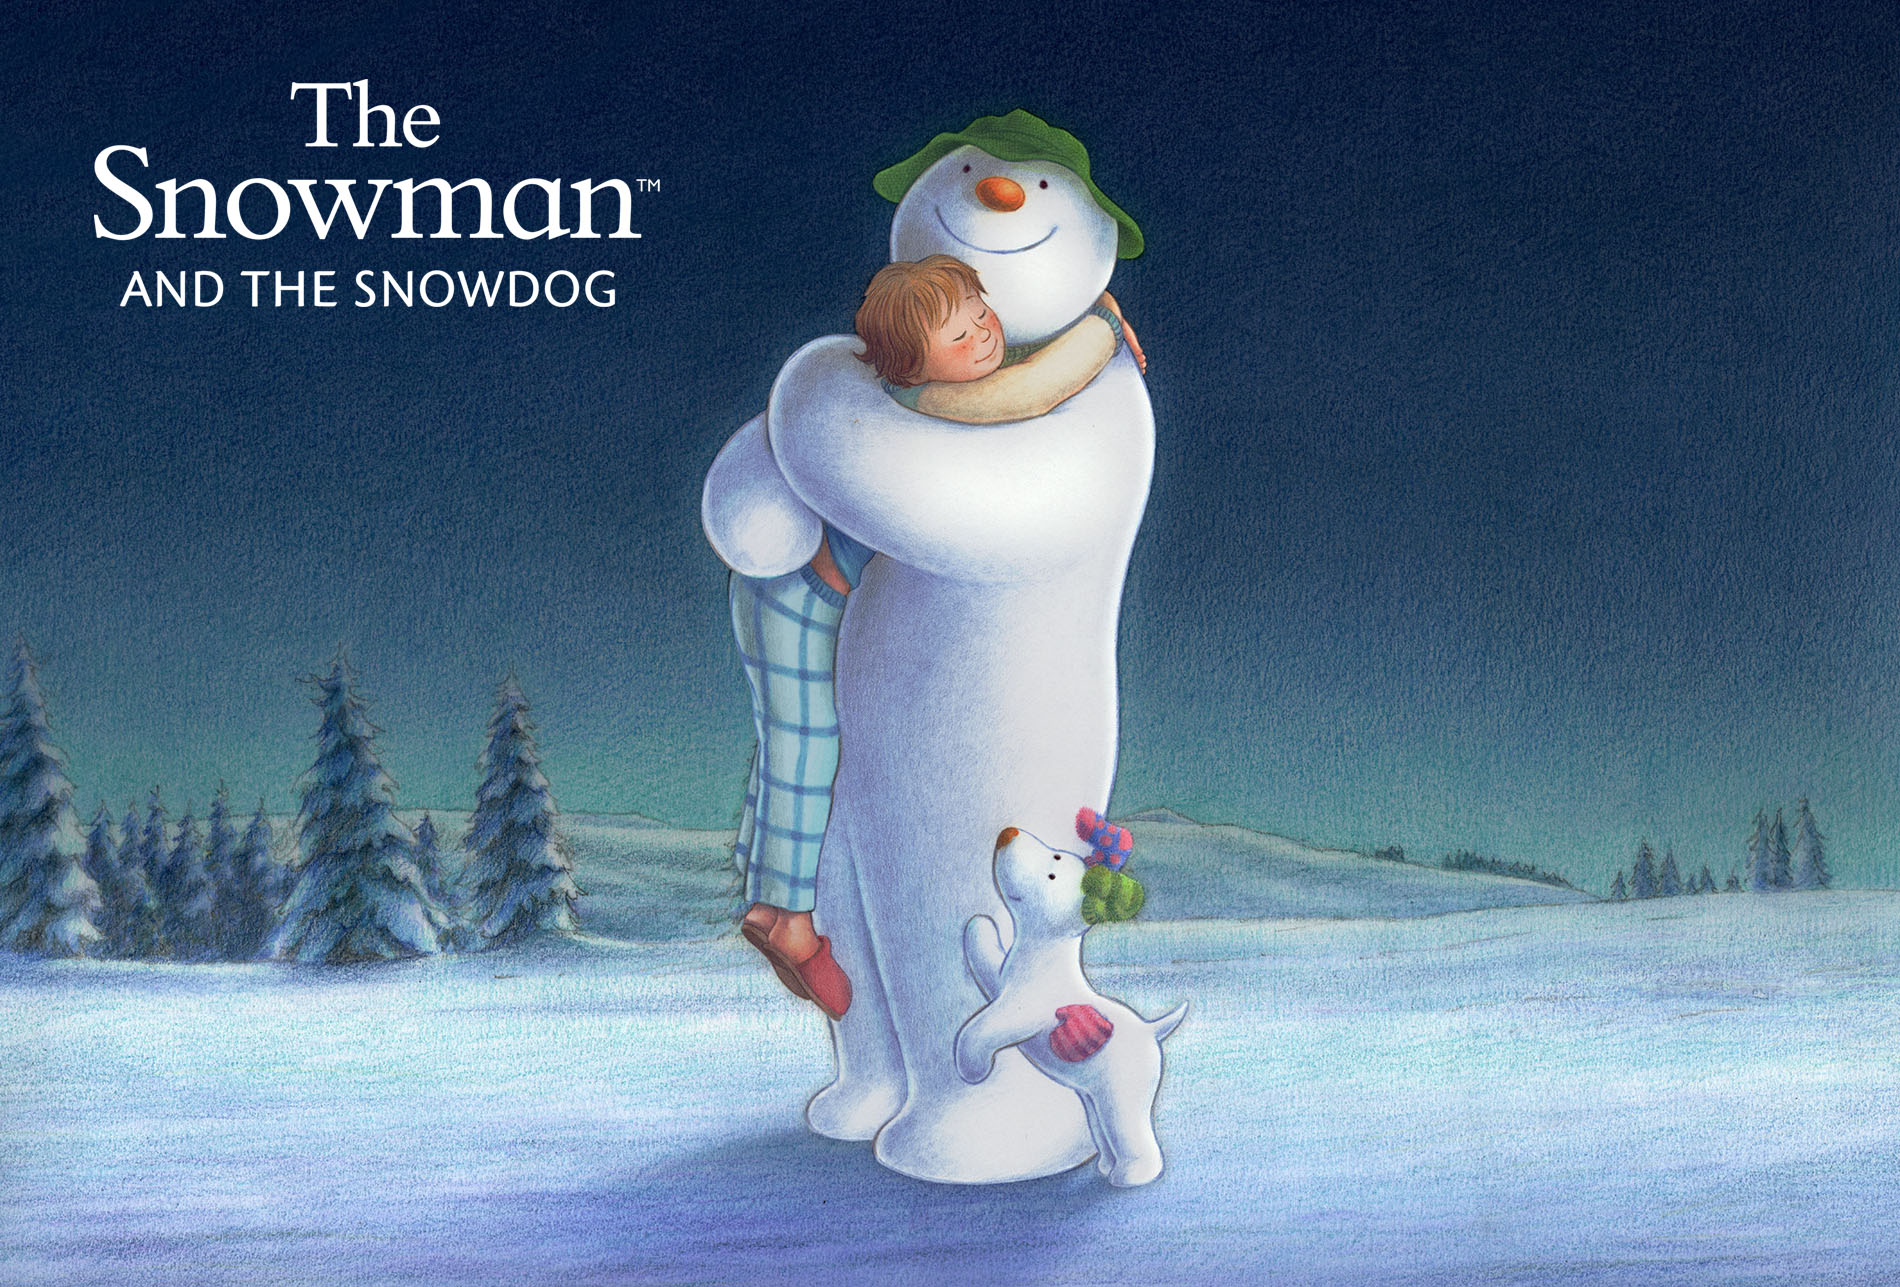 snowman-snowdog-title.jpg